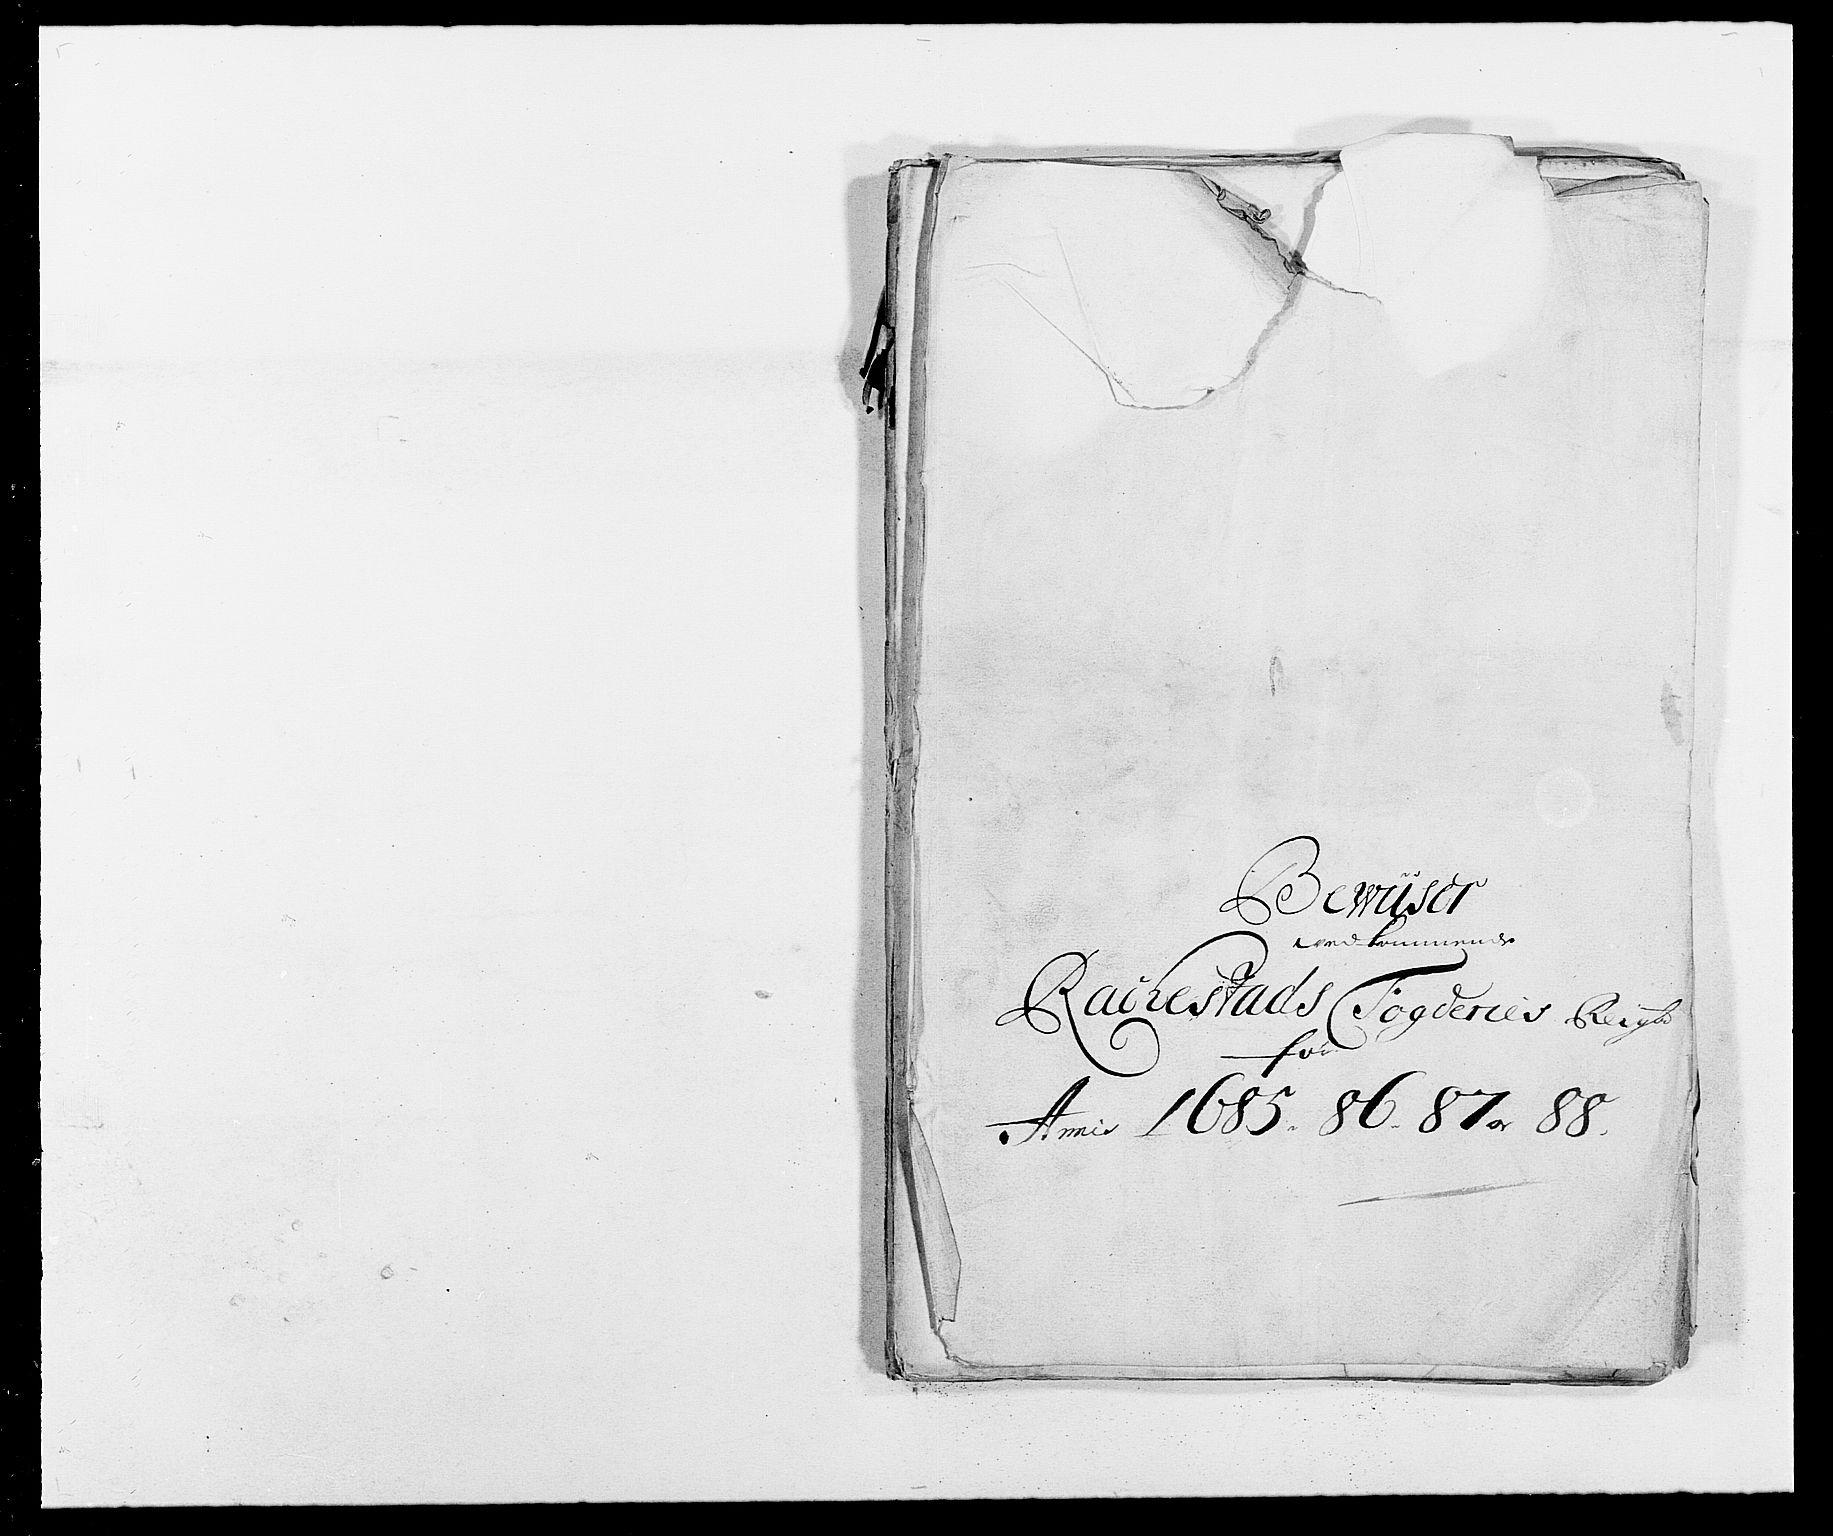 RA, Rentekammeret inntil 1814, Reviderte regnskaper, Fogderegnskap, R05/L0276: Fogderegnskap Rakkestad, 1683-1688, s. 272